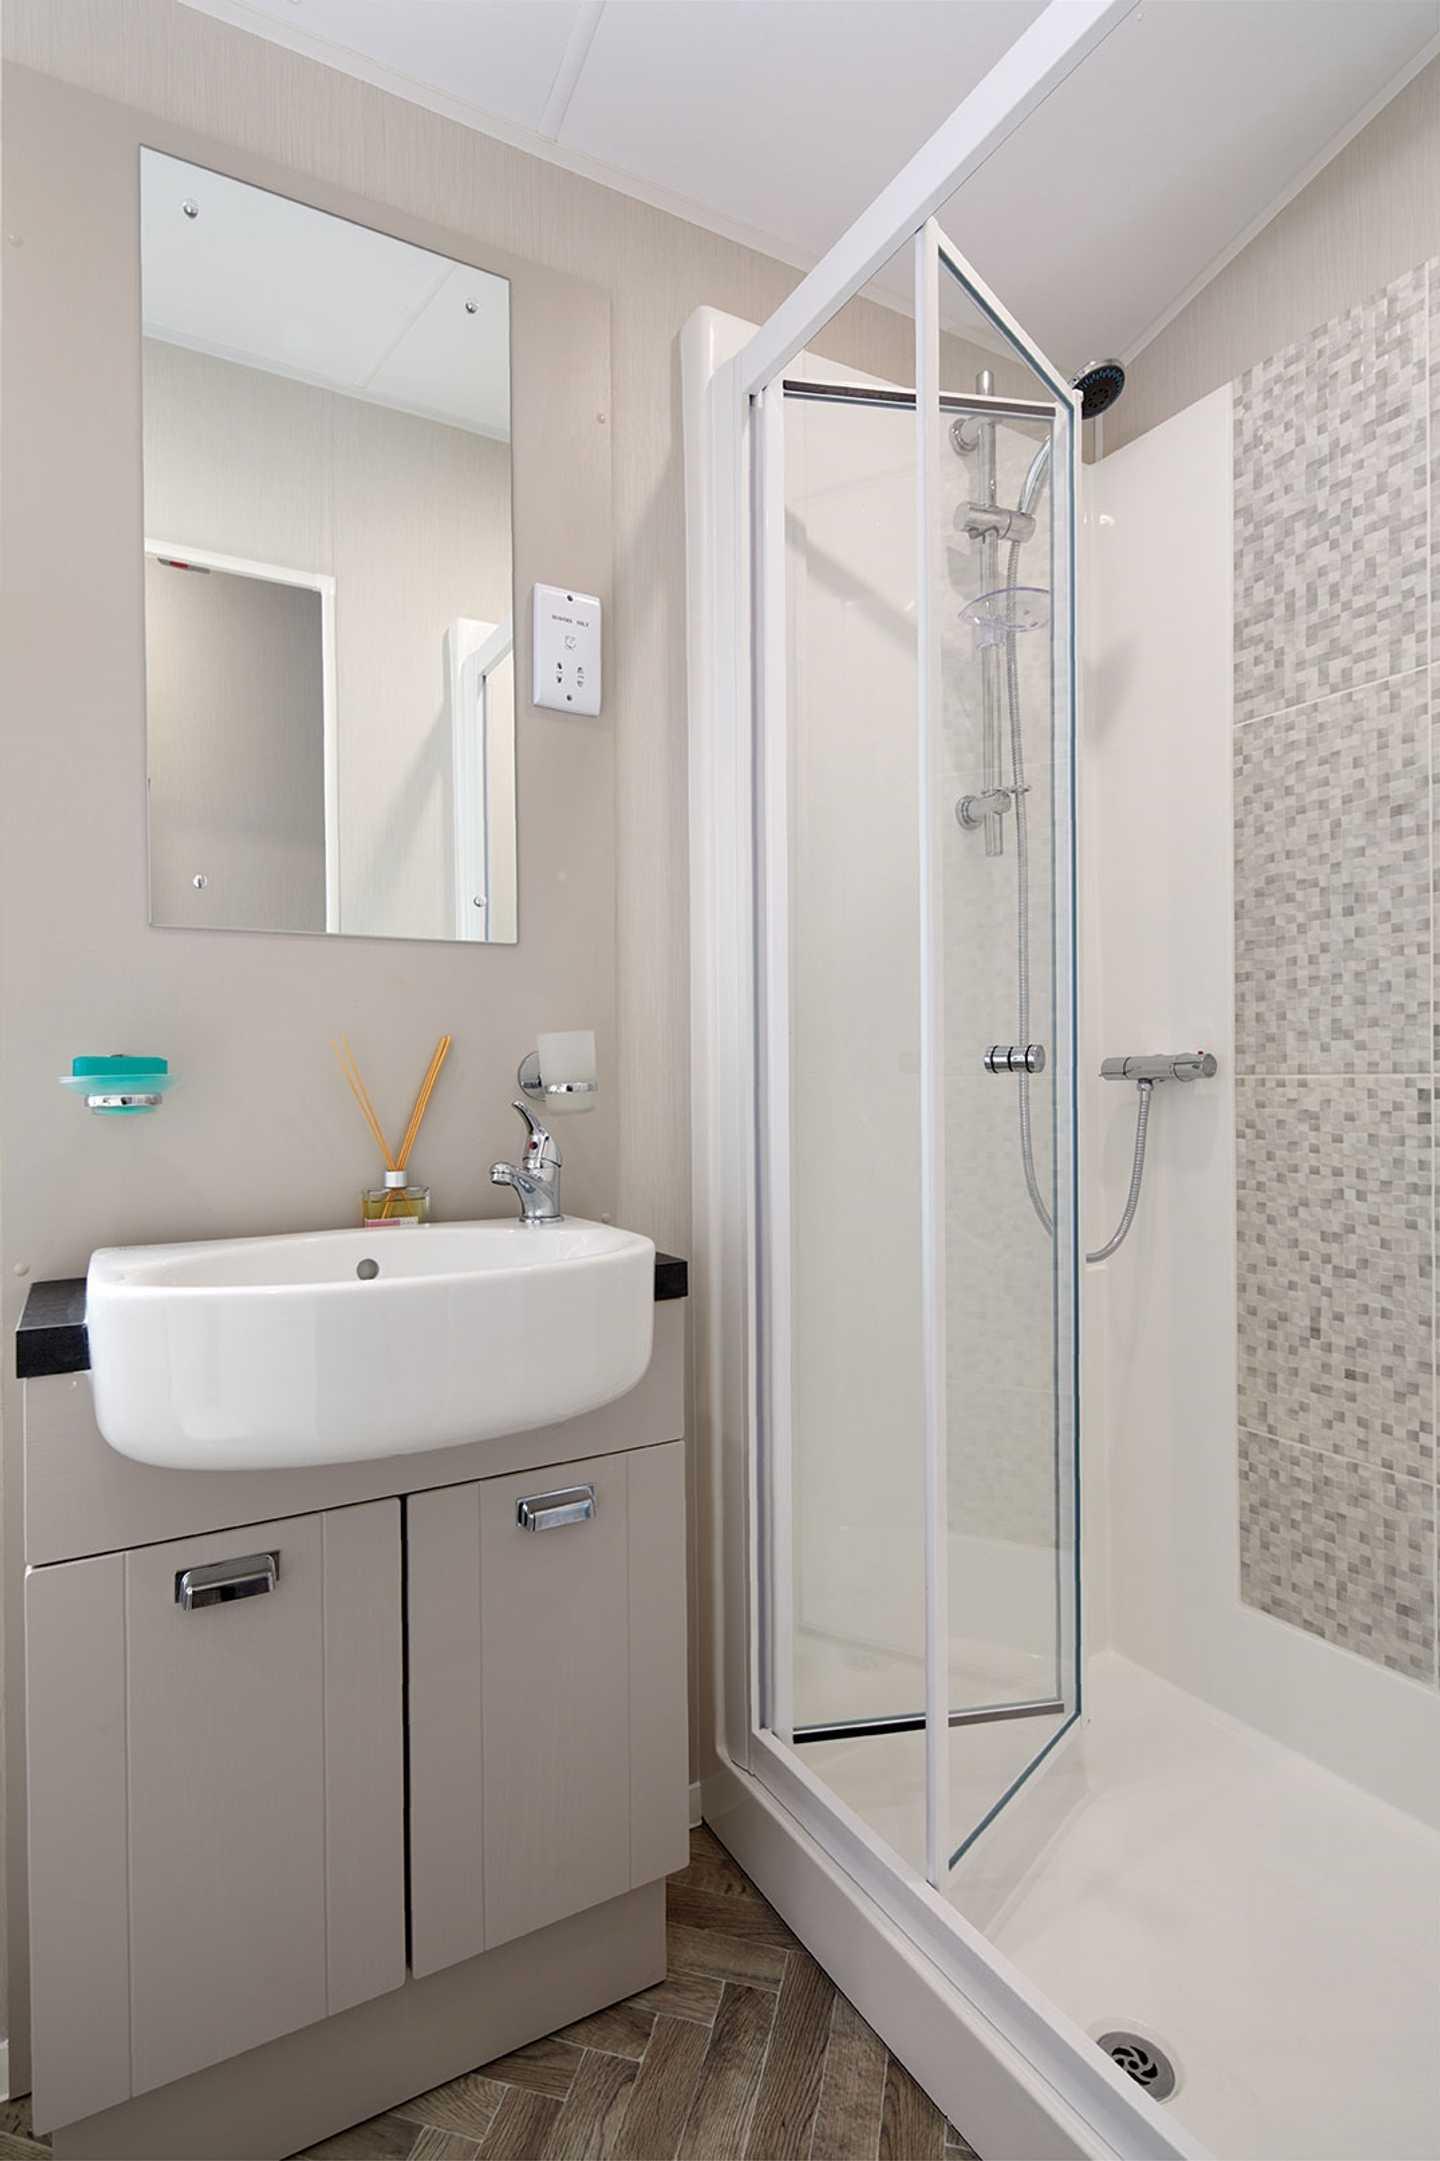 Willerby Sheraton bathroom